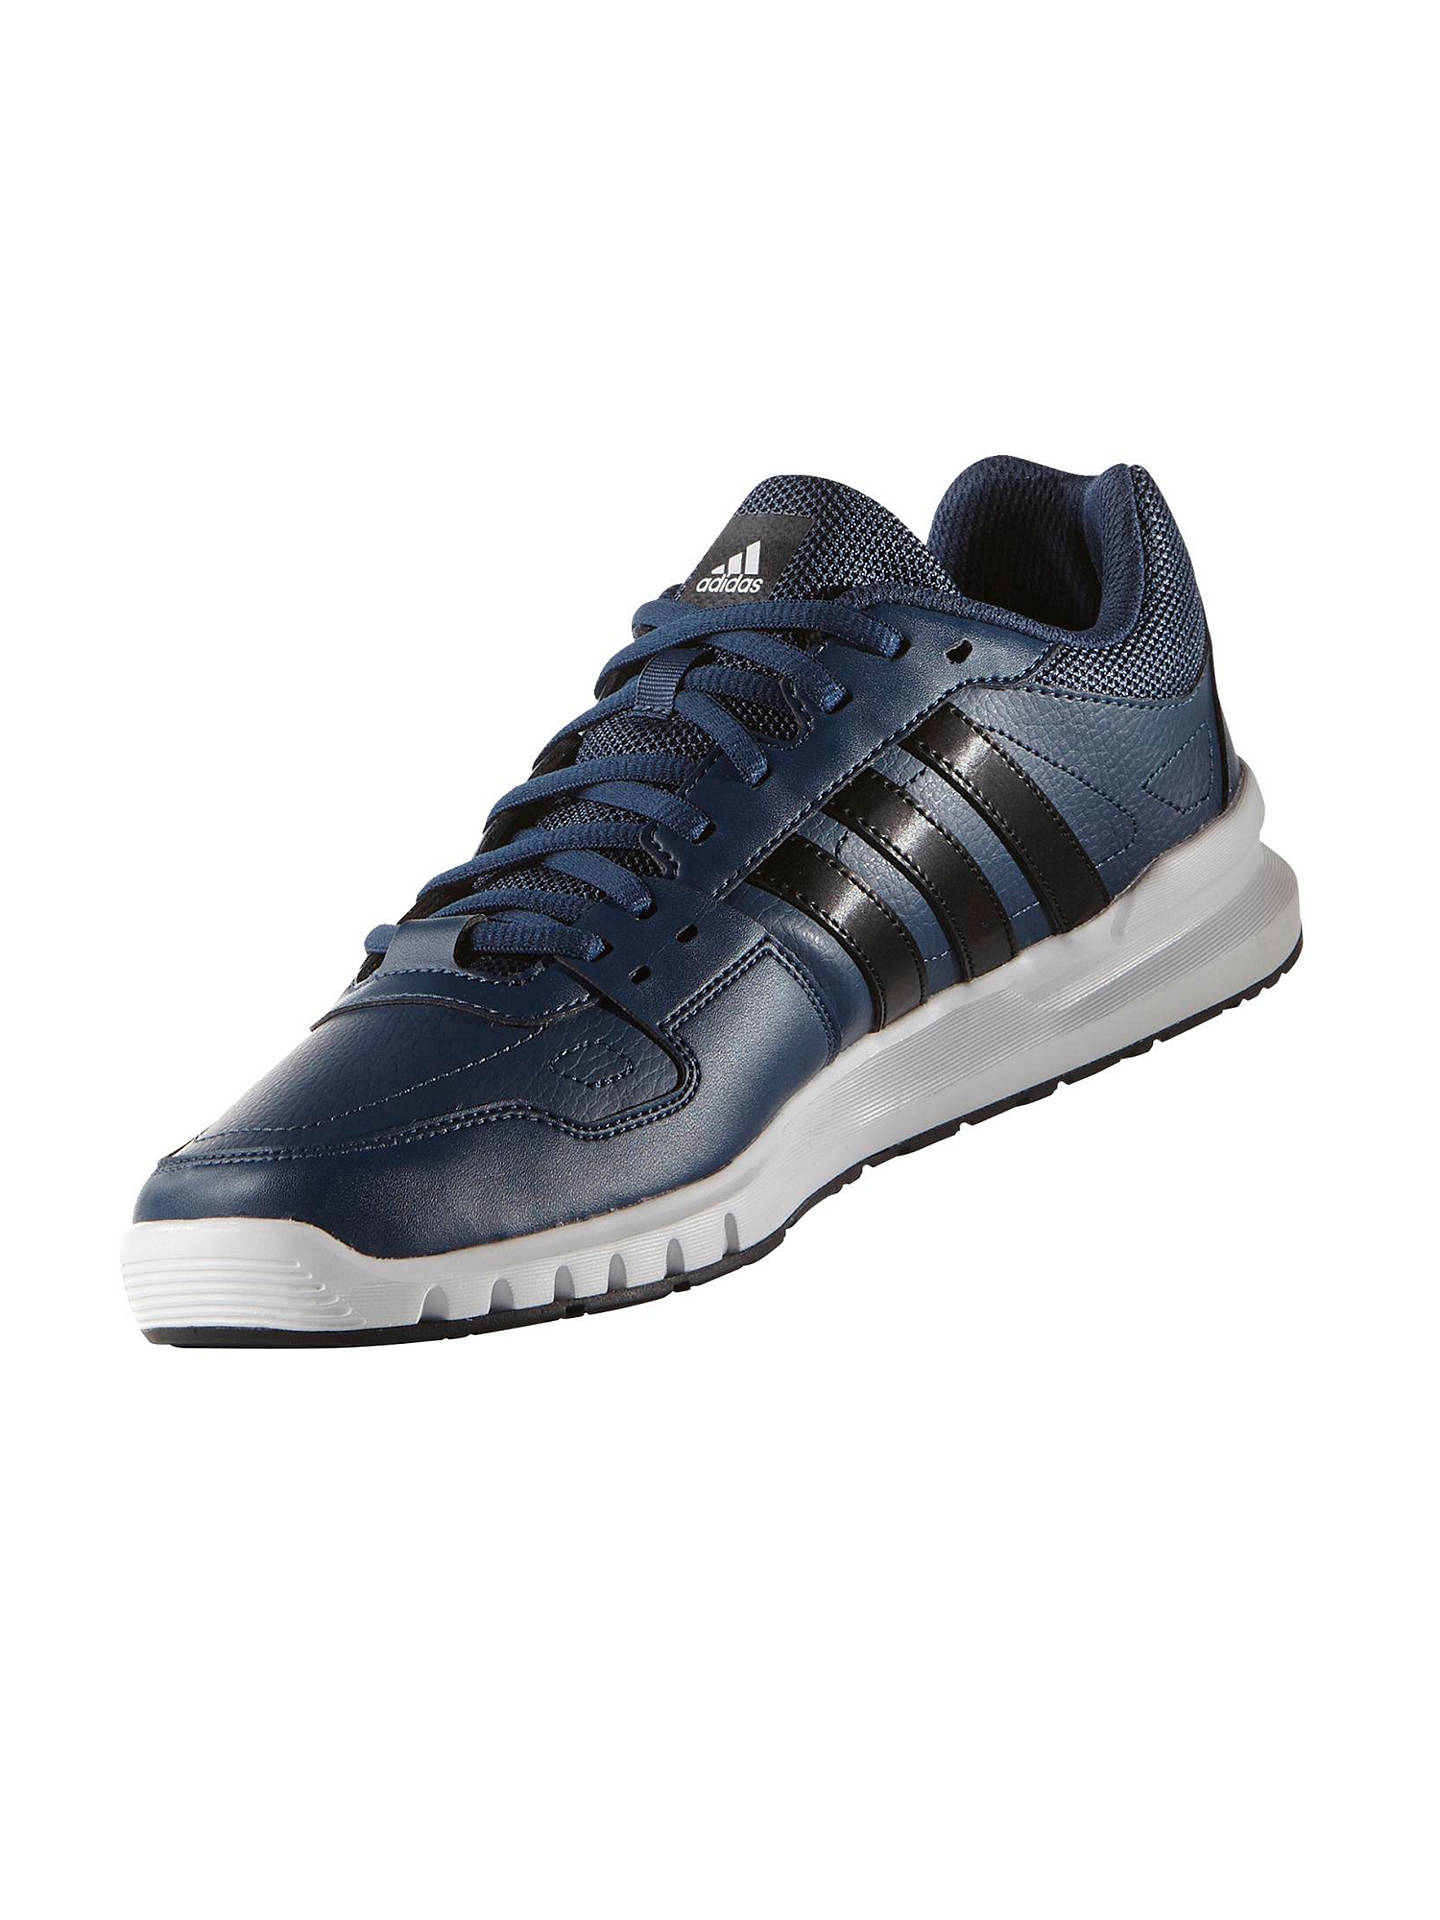 Star Lewis Cross 0 TrainersMineral Blue Adidas Essential 2 John At OkXZPui